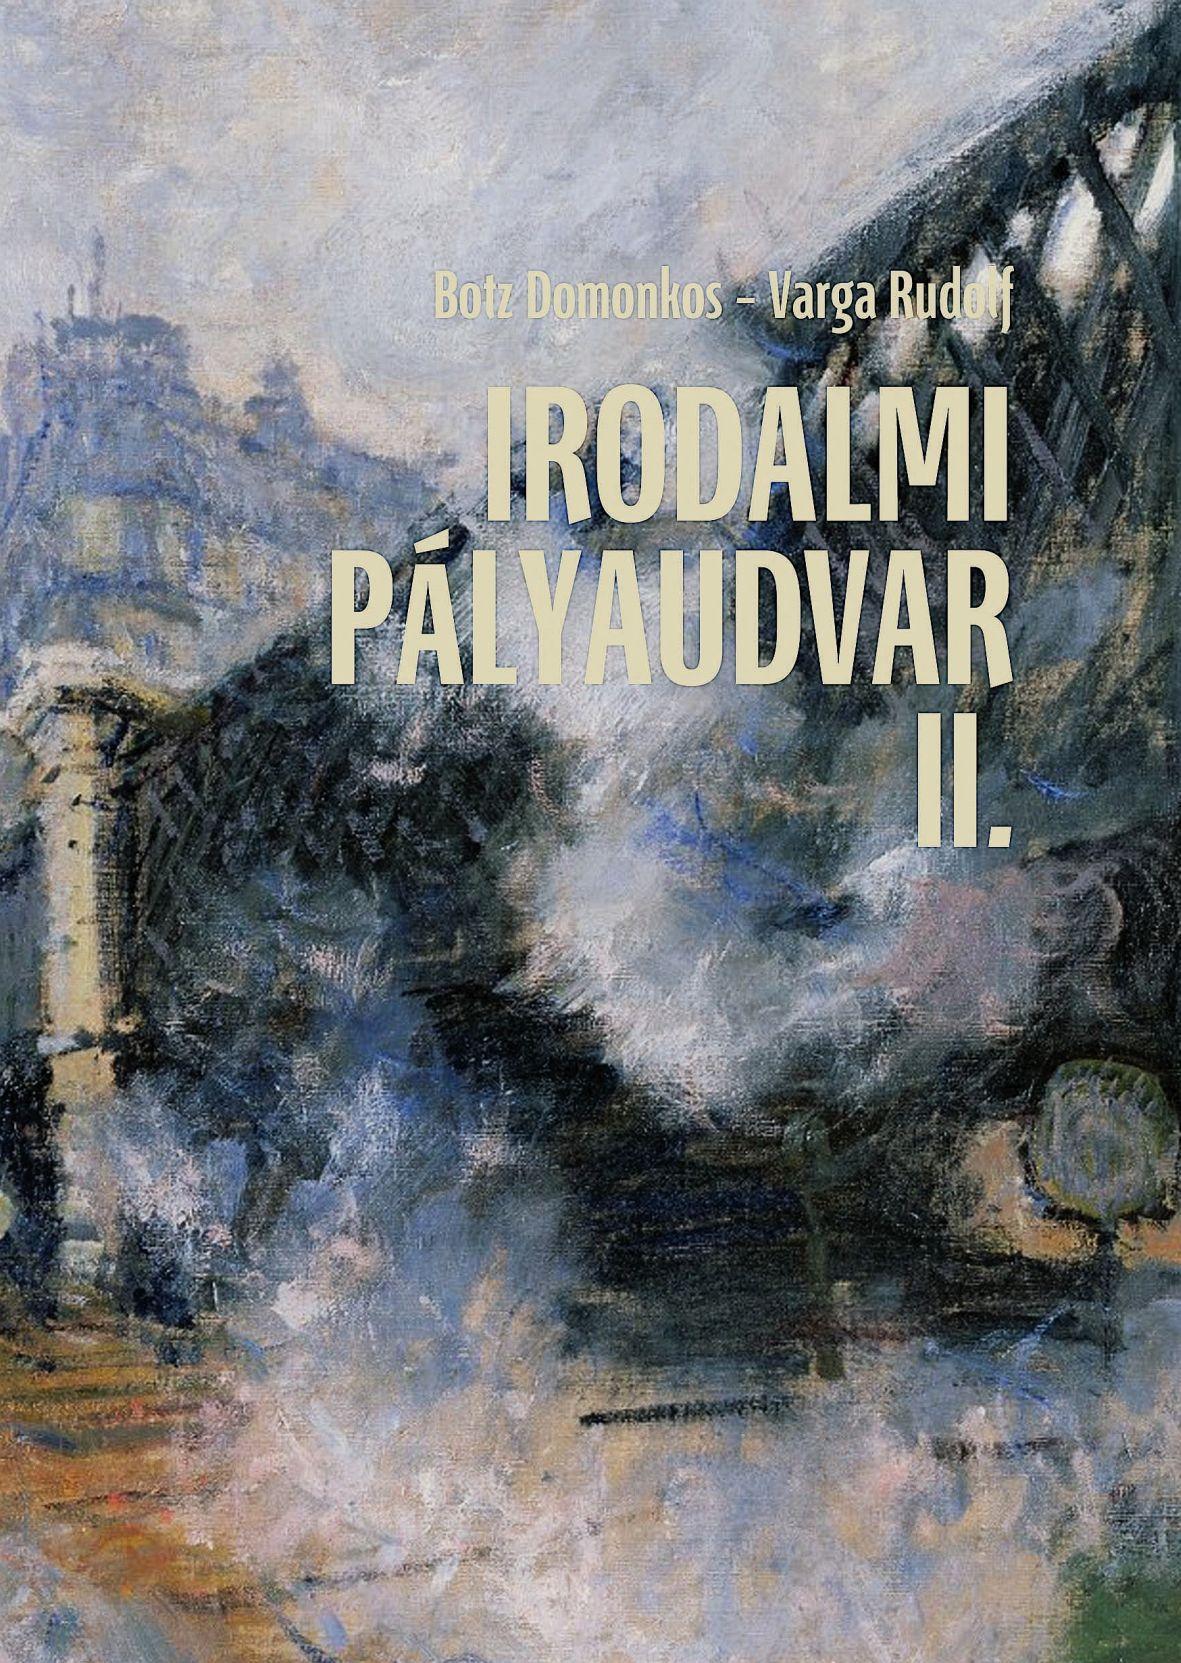 IRODALMI PÁLYAUDVAR II.